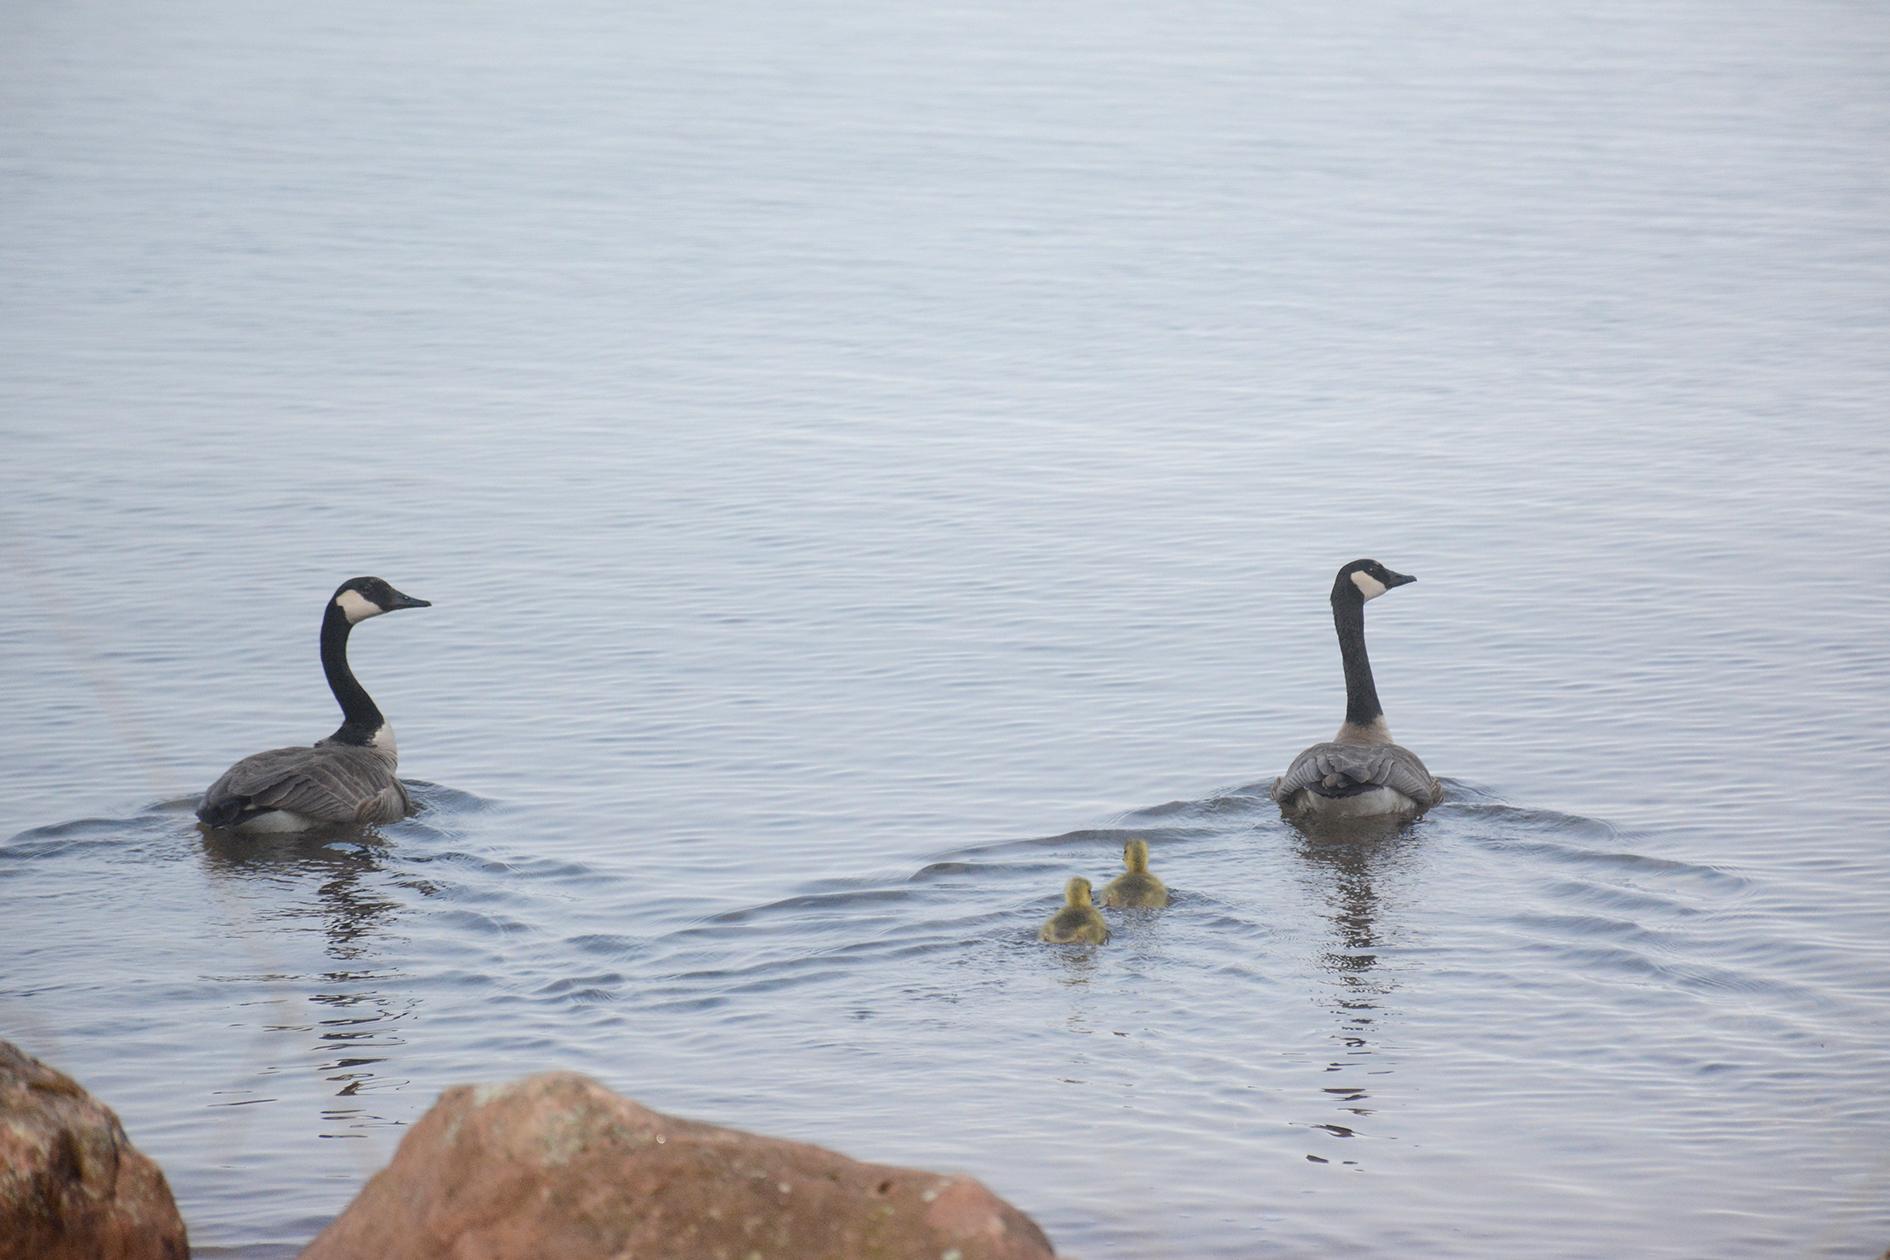 2015-05-16_stocktonisland_bird-geese